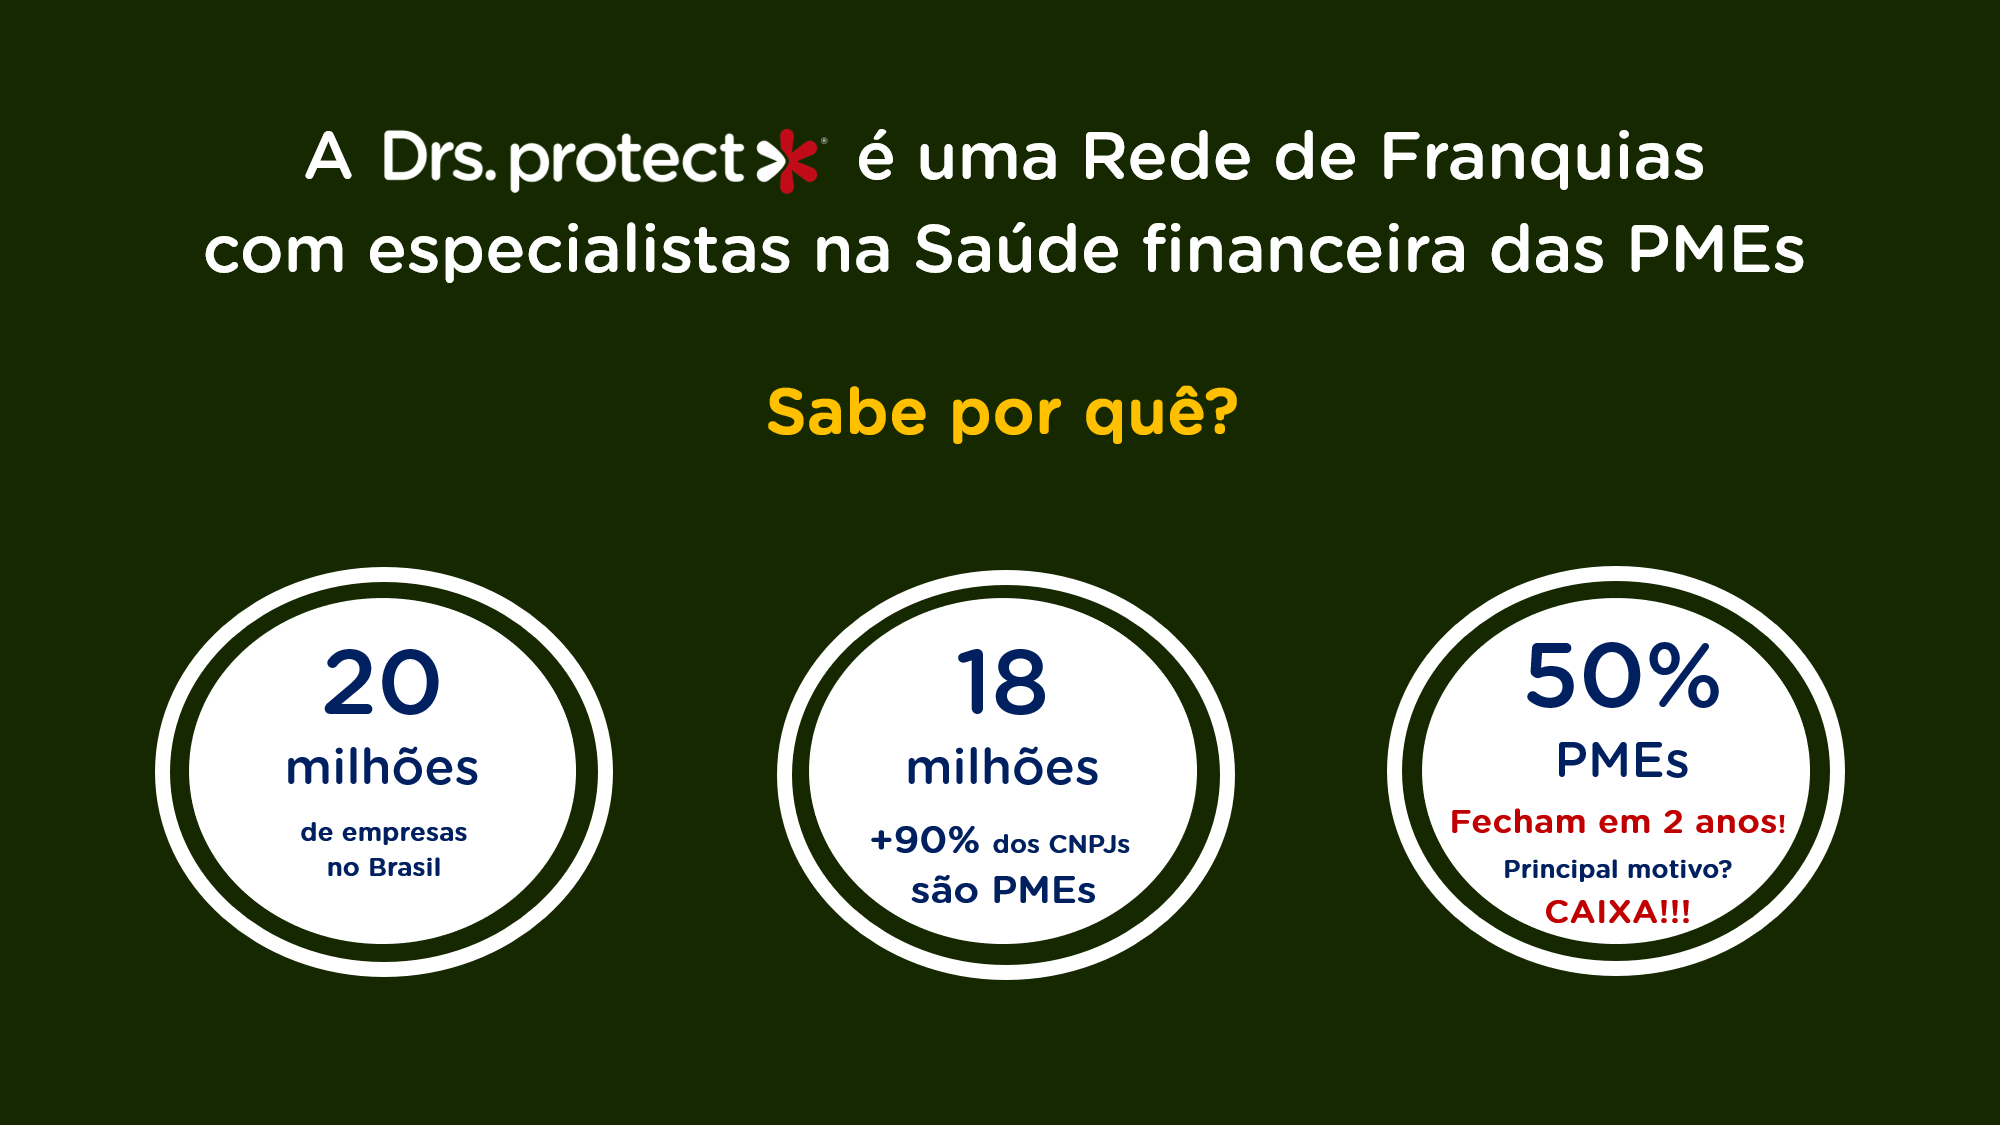 Drs. protect, especialistas na Saúde financeira